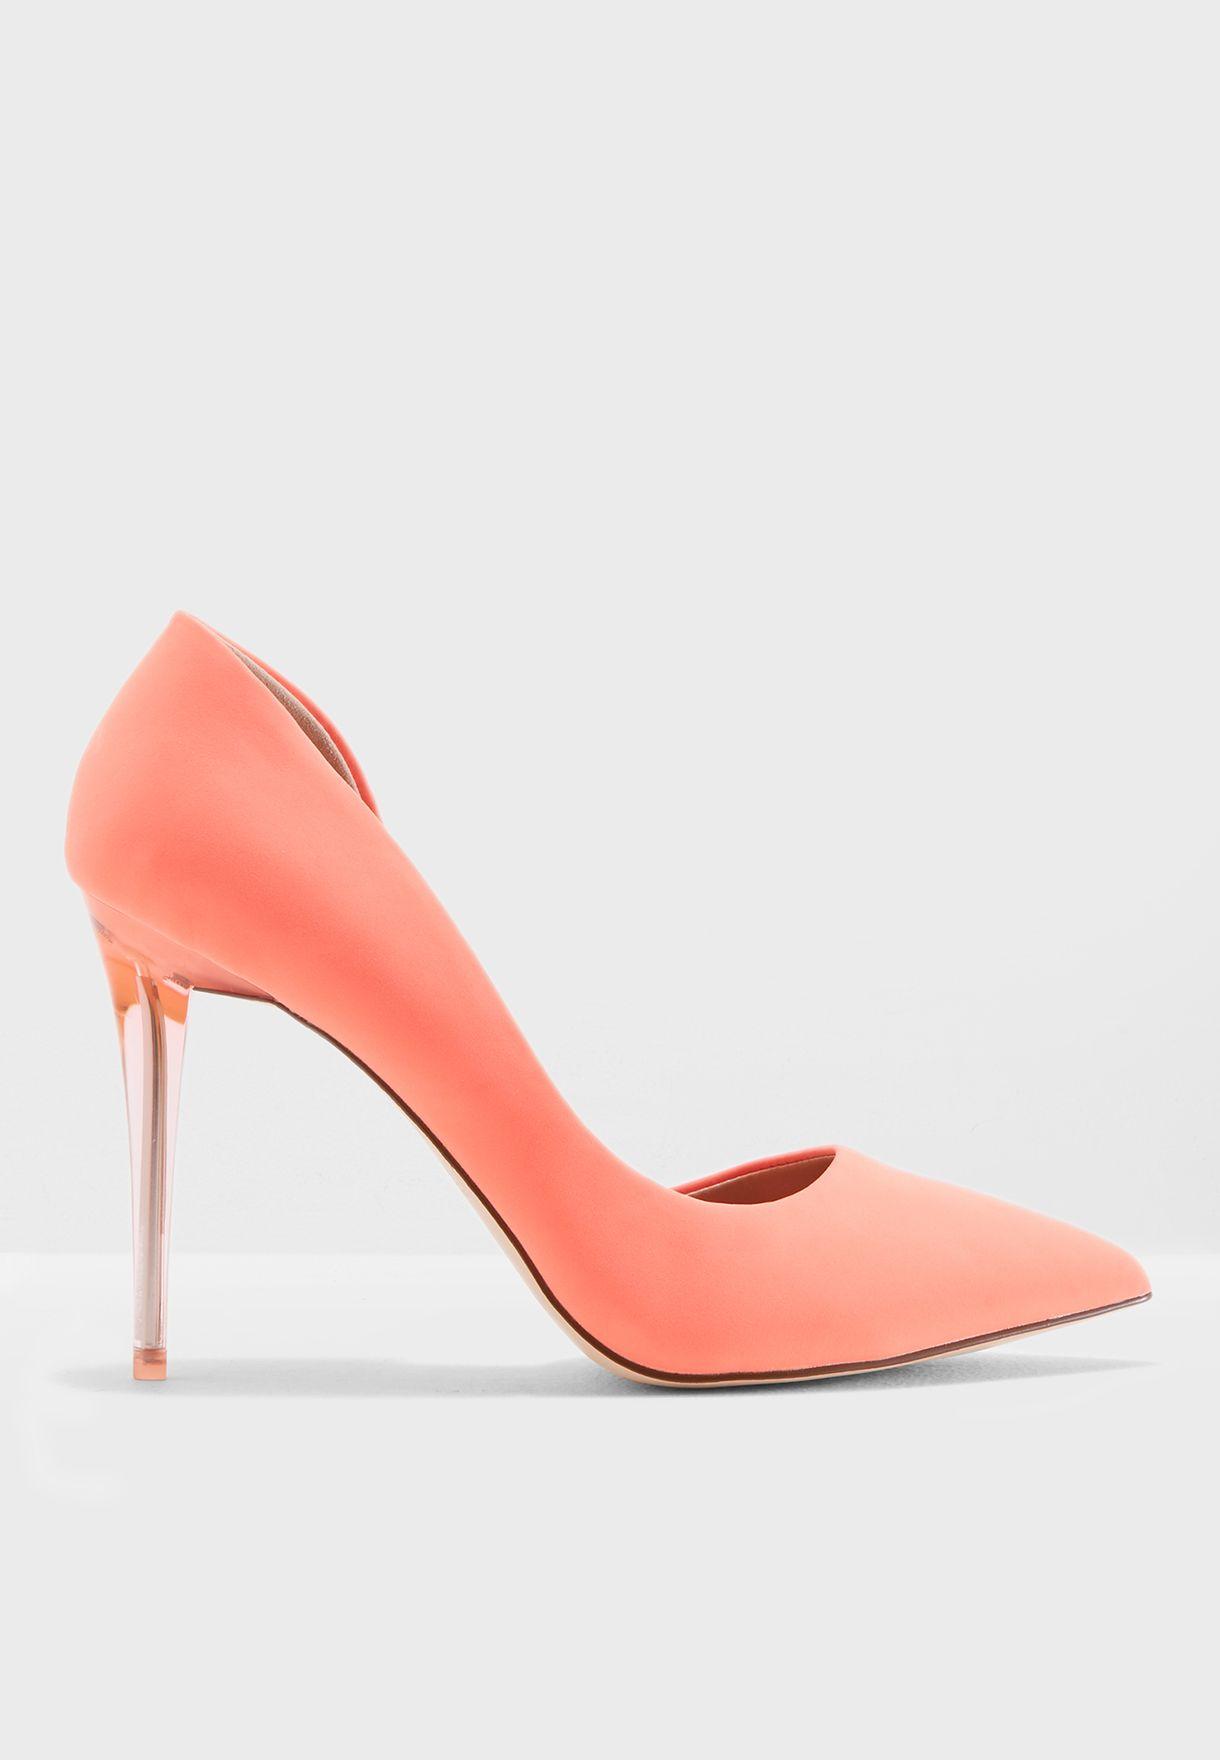 5fdea5976bcb Shop Call It Spring pink Neon Thaoven Pump THAOVEN820 for Women in ...